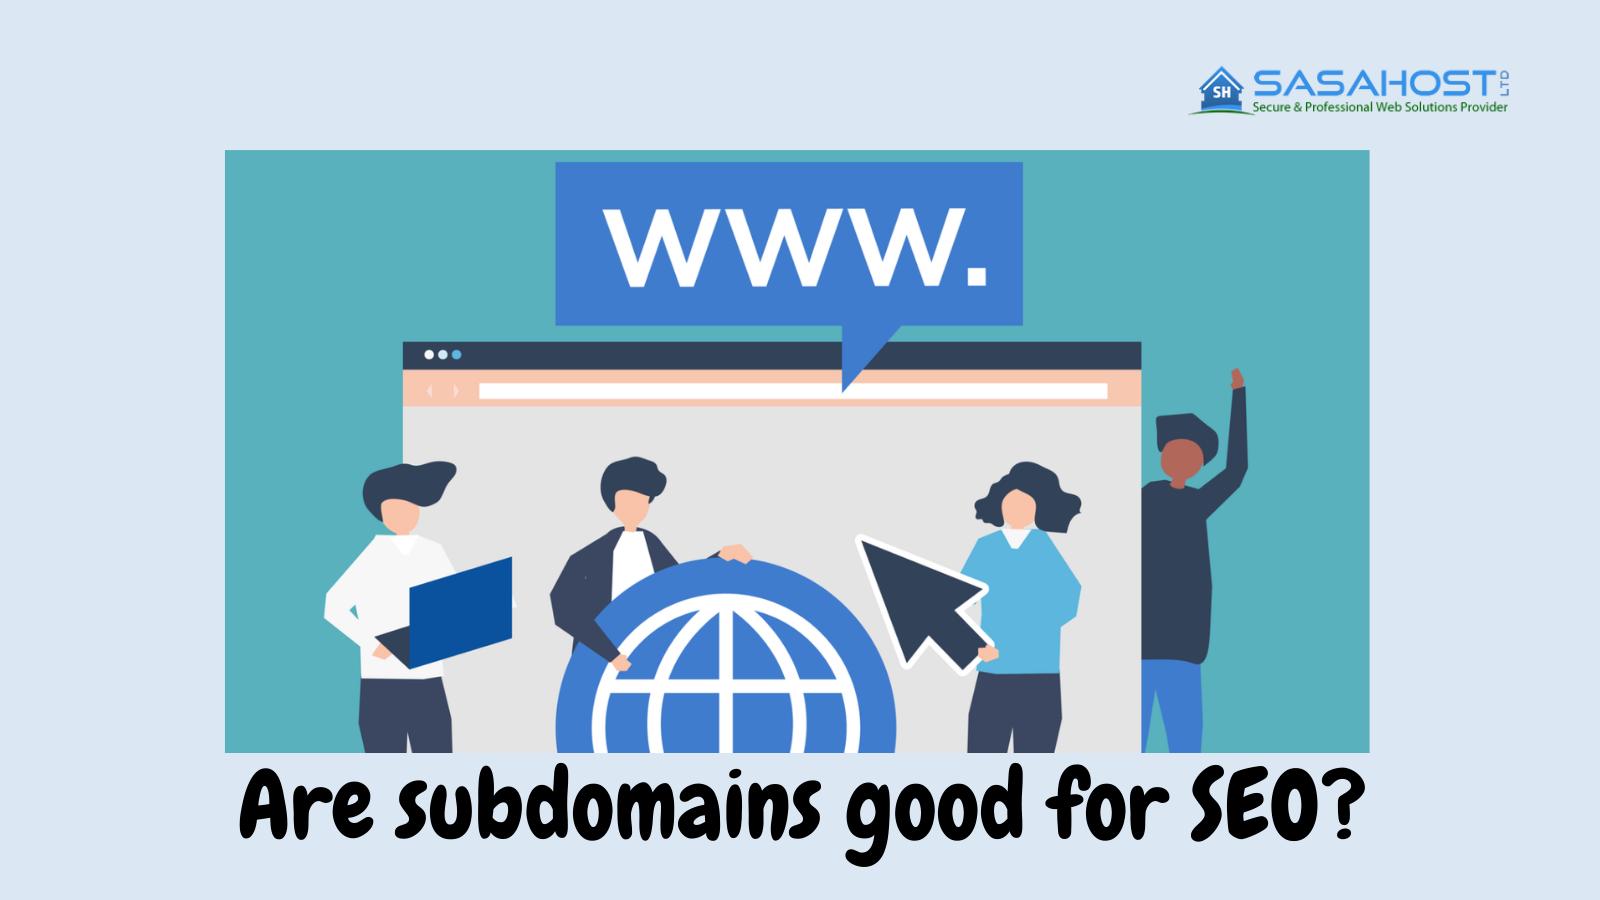 subdomains